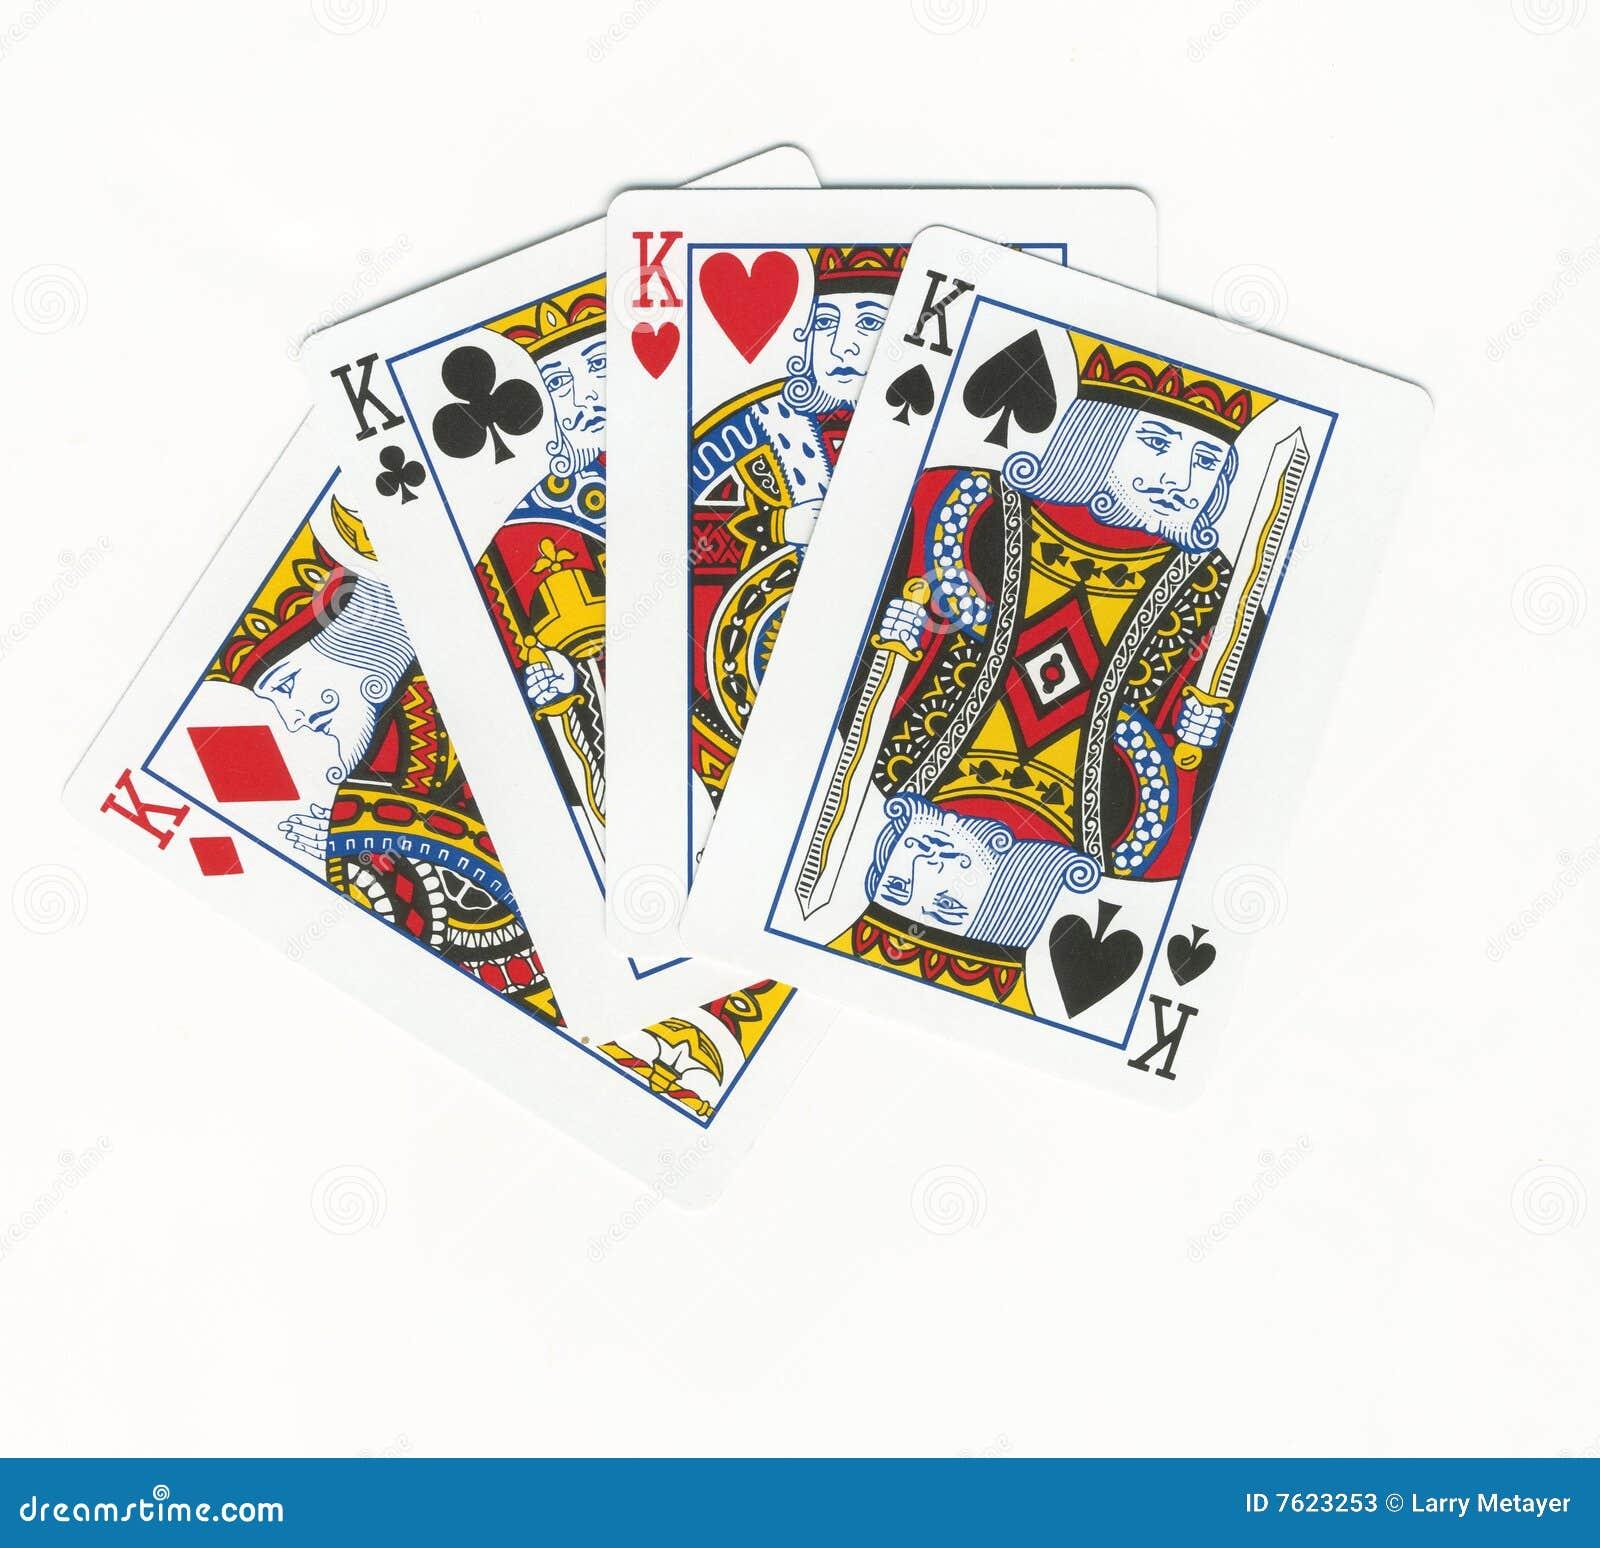 kings card casino